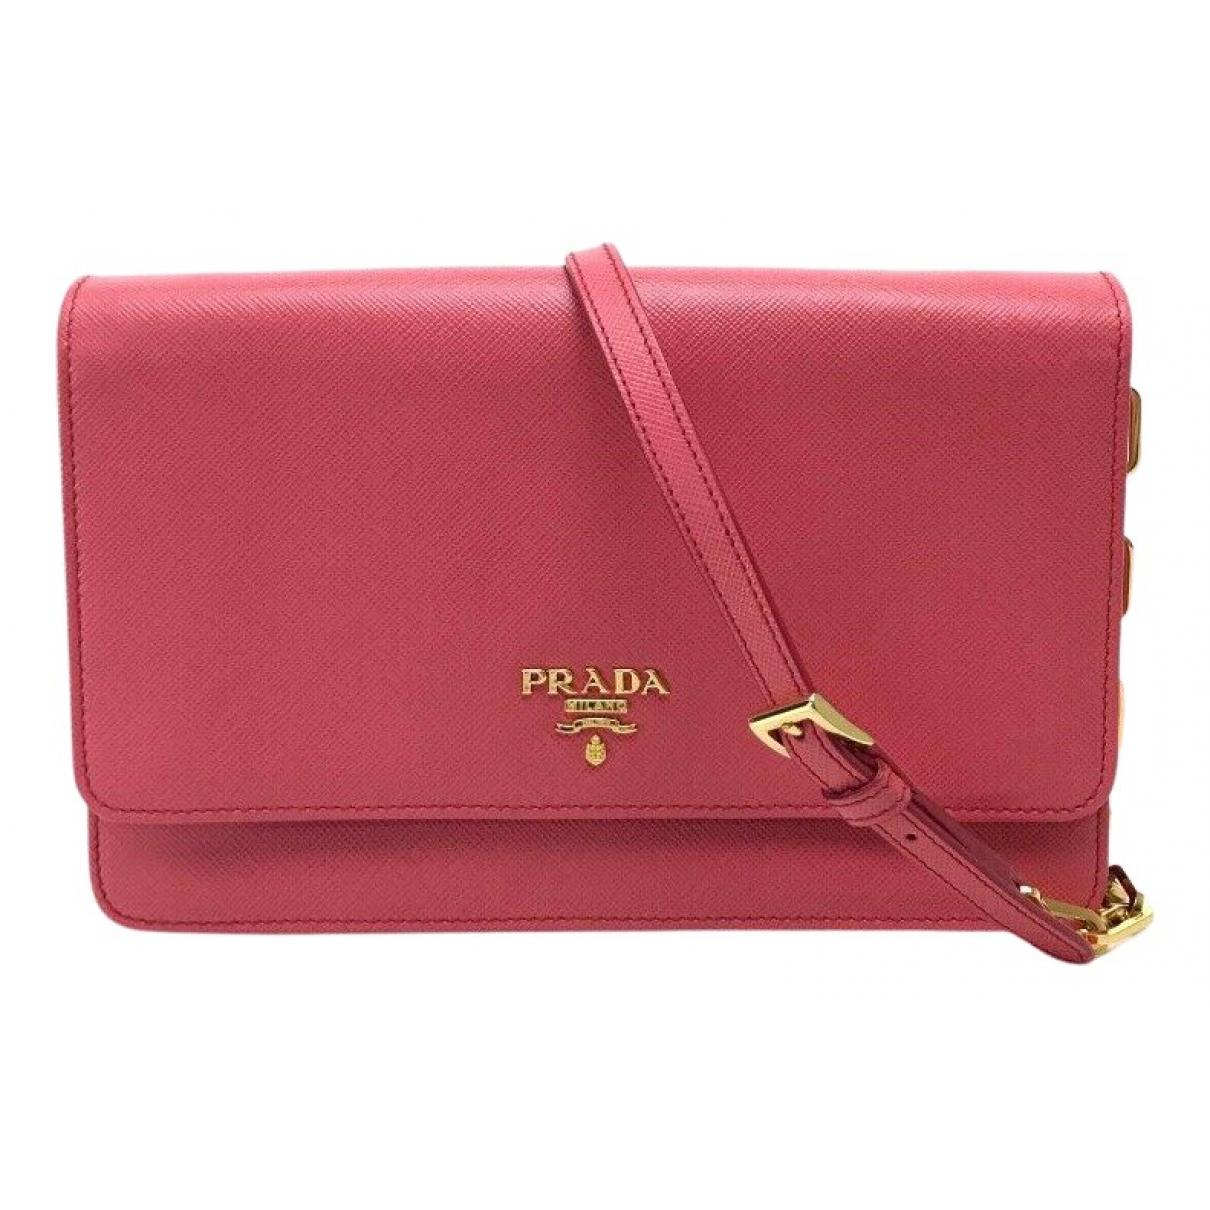 Prada N Leather handbag for Women N